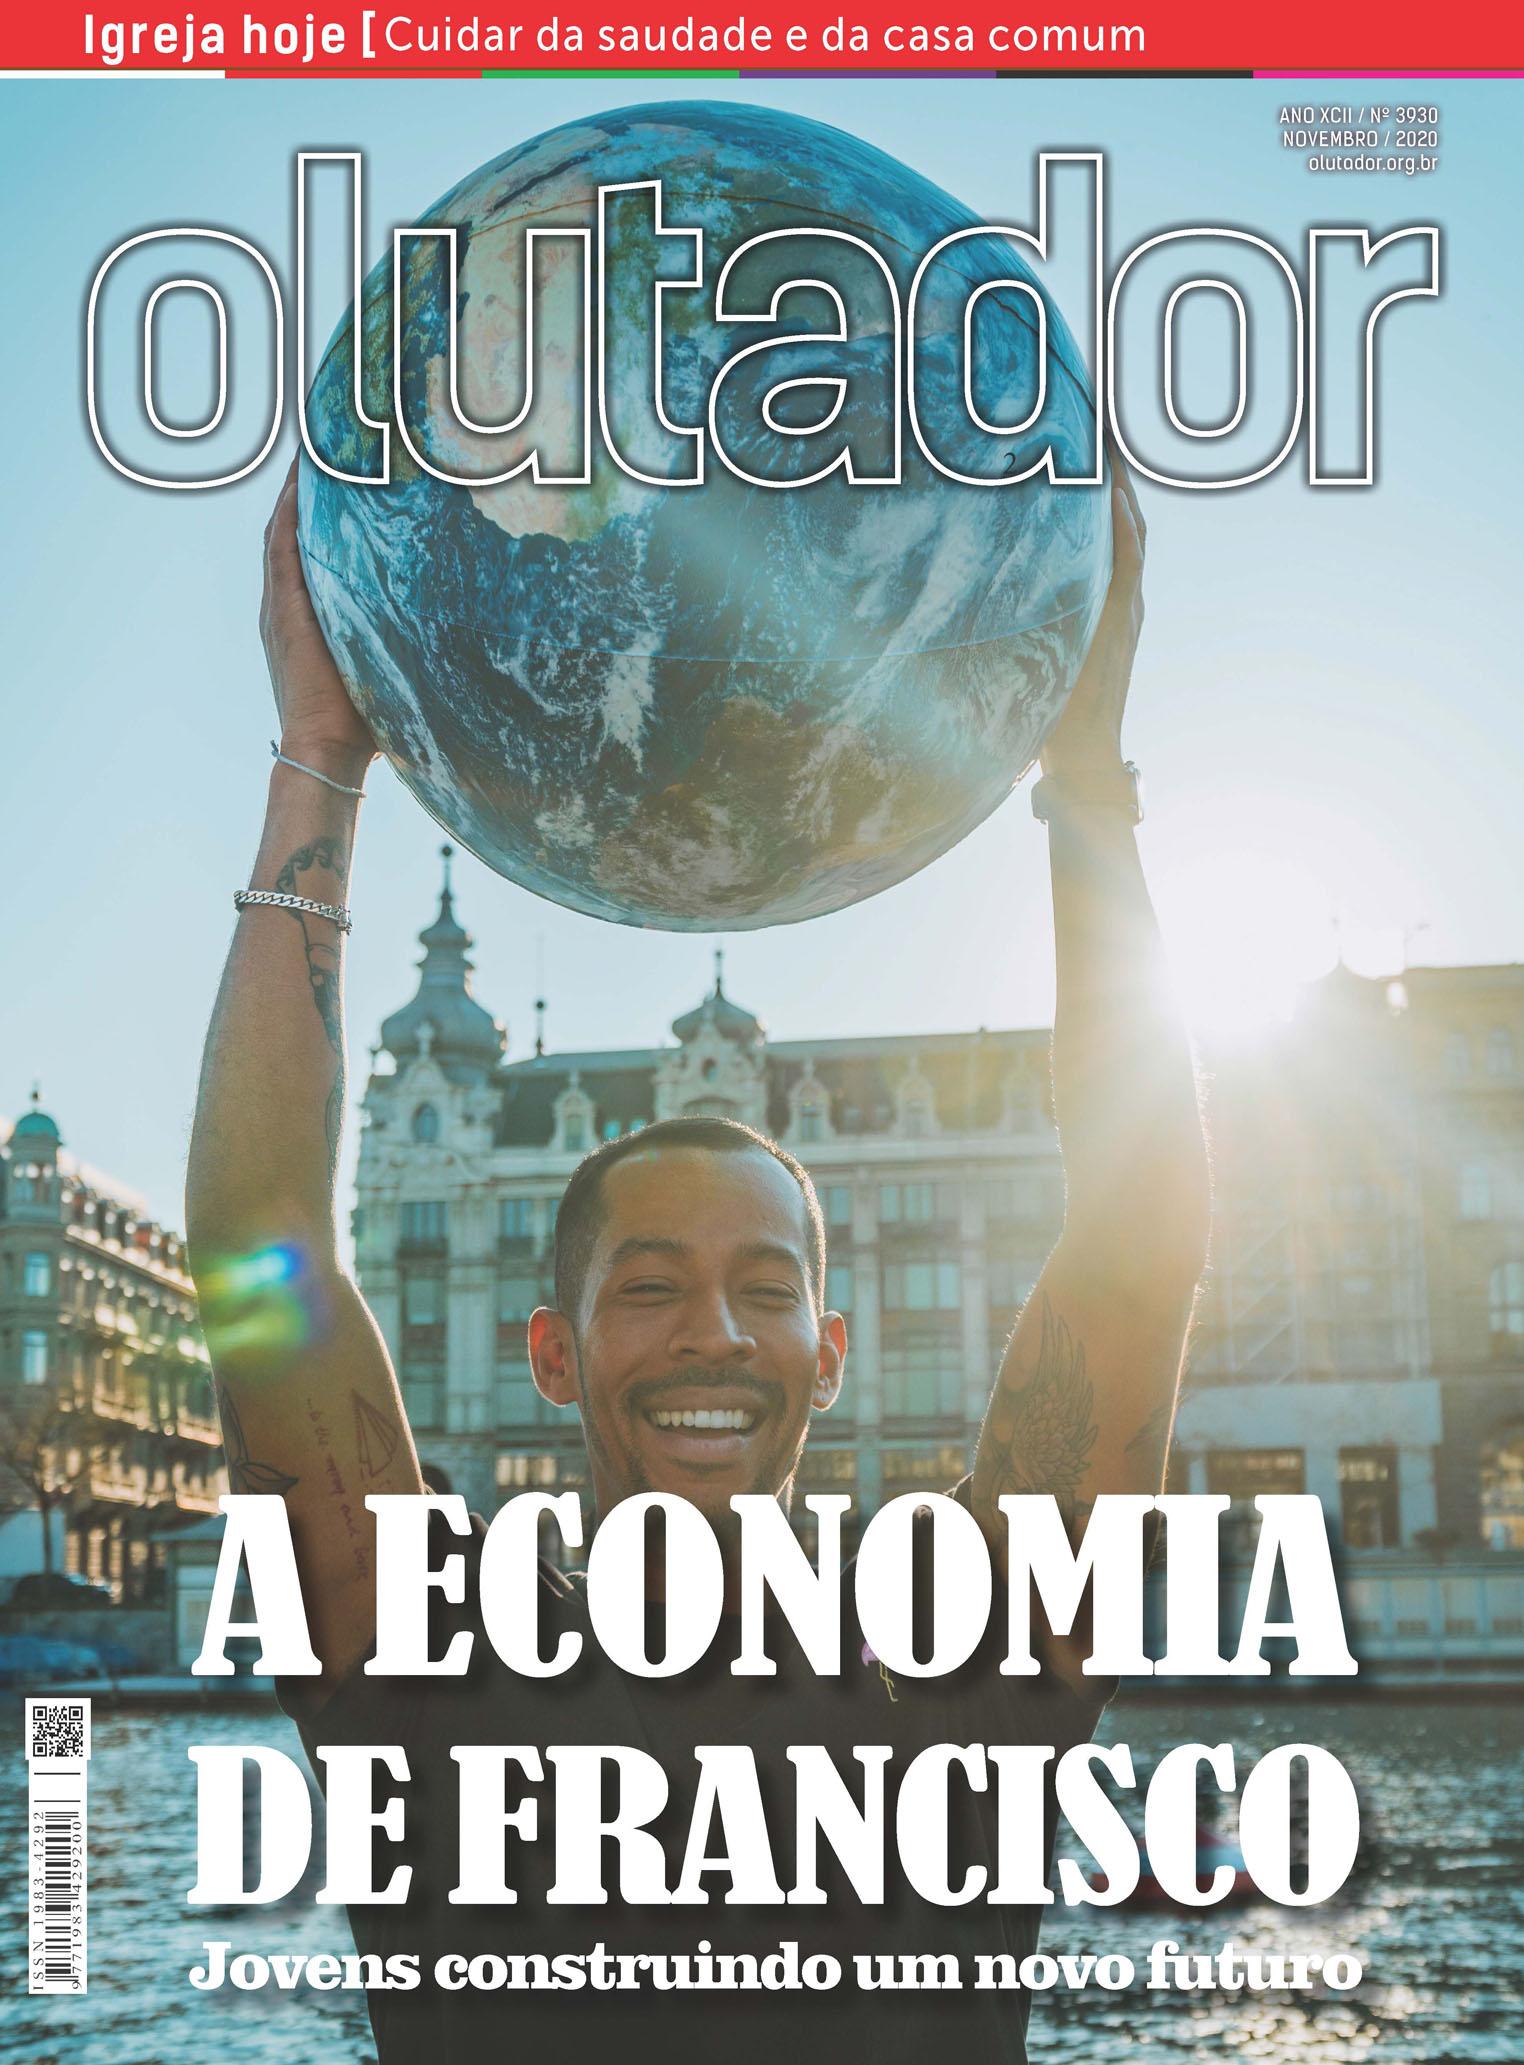 A Economia de Francisco